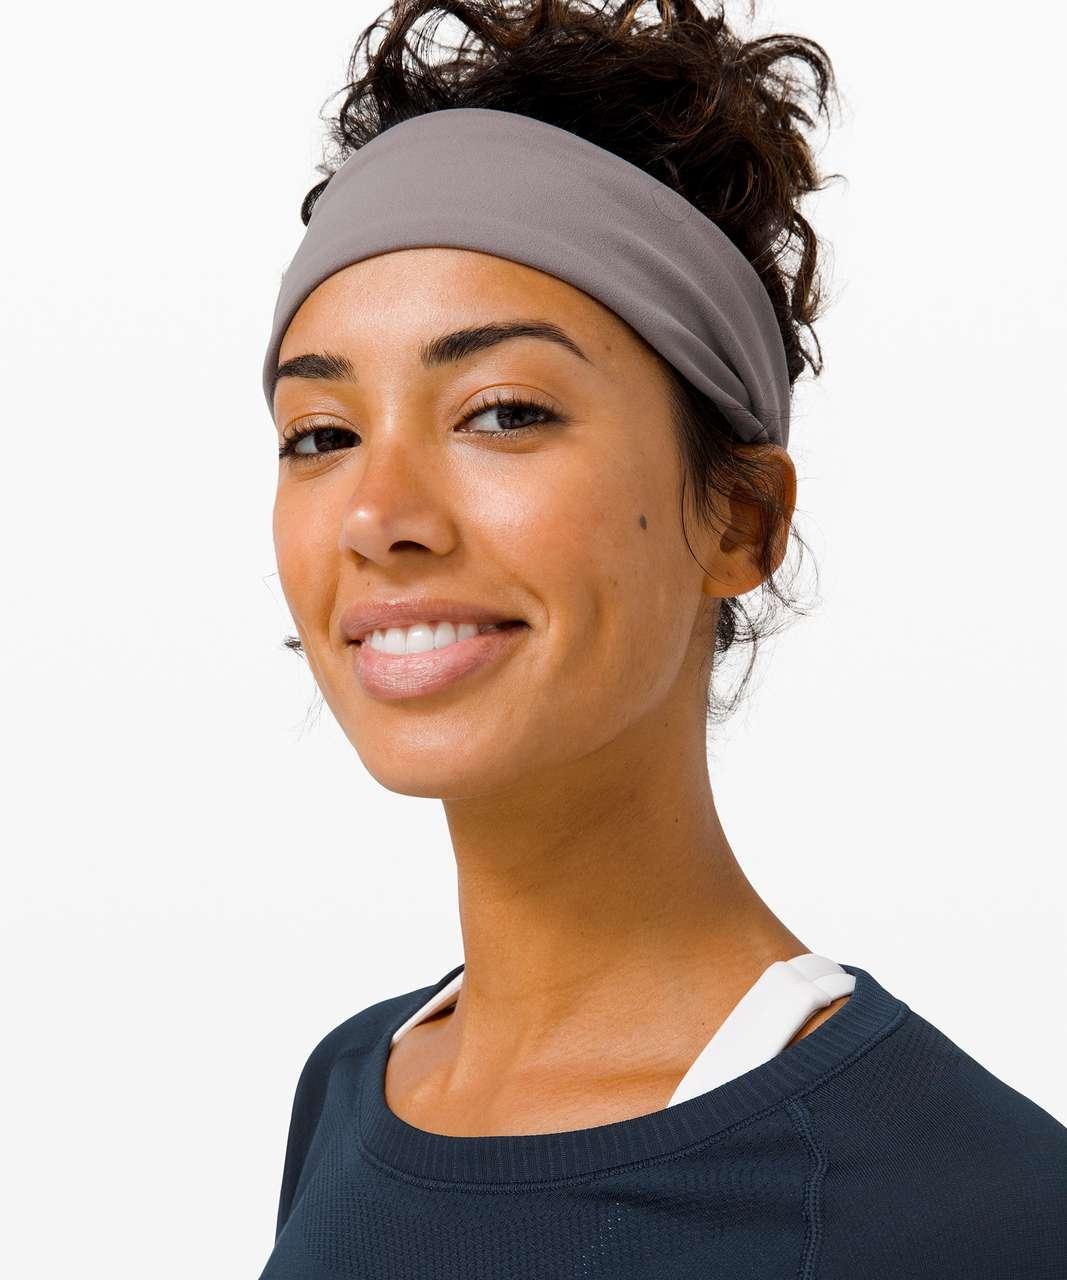 Lululemon Fringe Fighter Headband - Pixel Jacquard Alpine White Mink Berry / Lunar Rock